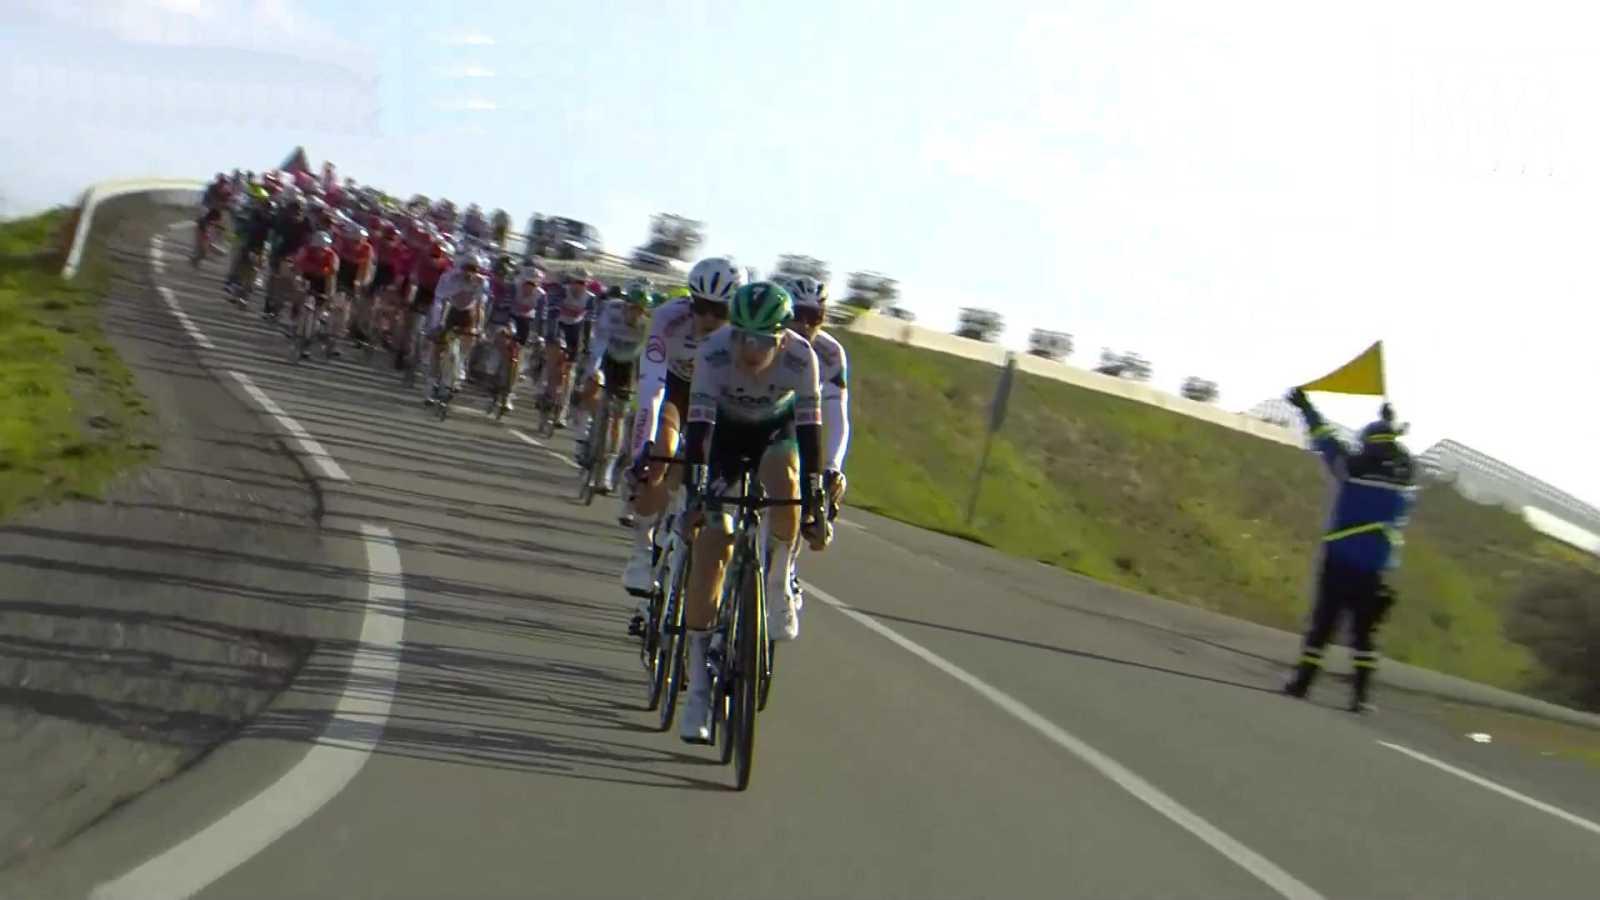 Ciclismo - Étoile de Bessèges - Tour de Gard. 1ª etapa: Bellegarde - Bellegarde - ver ahora